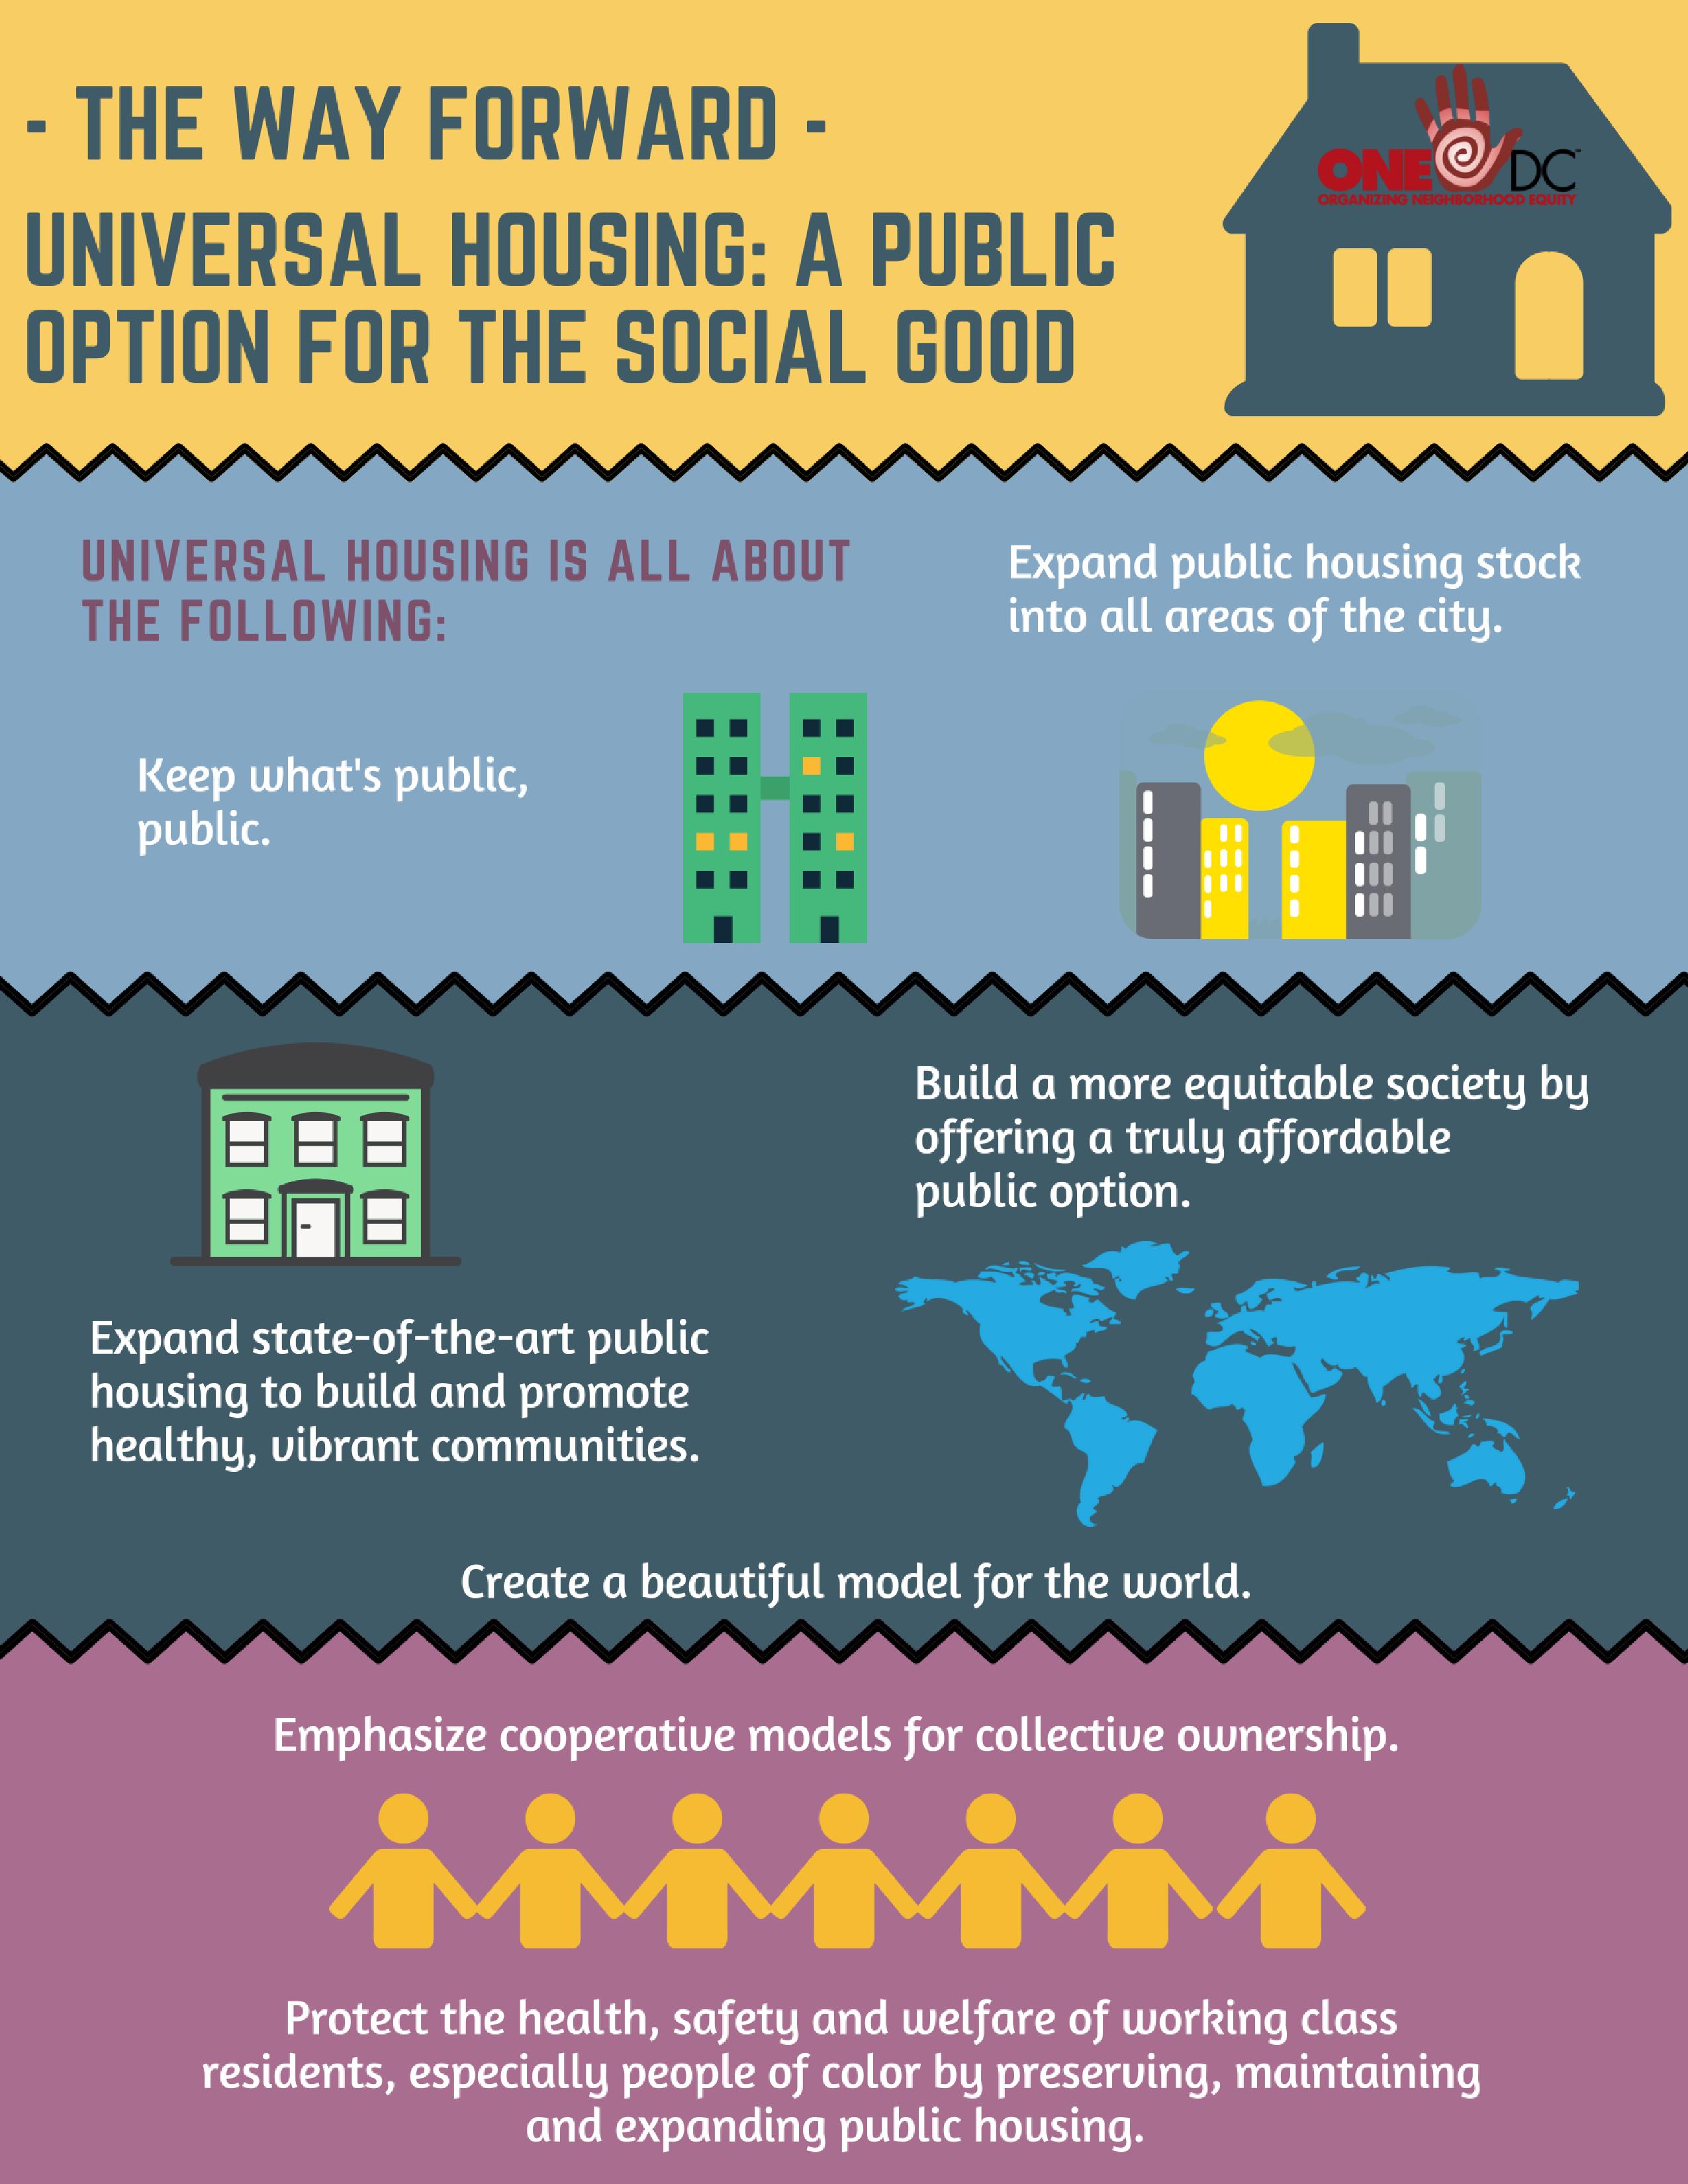 universal_housing_1.png